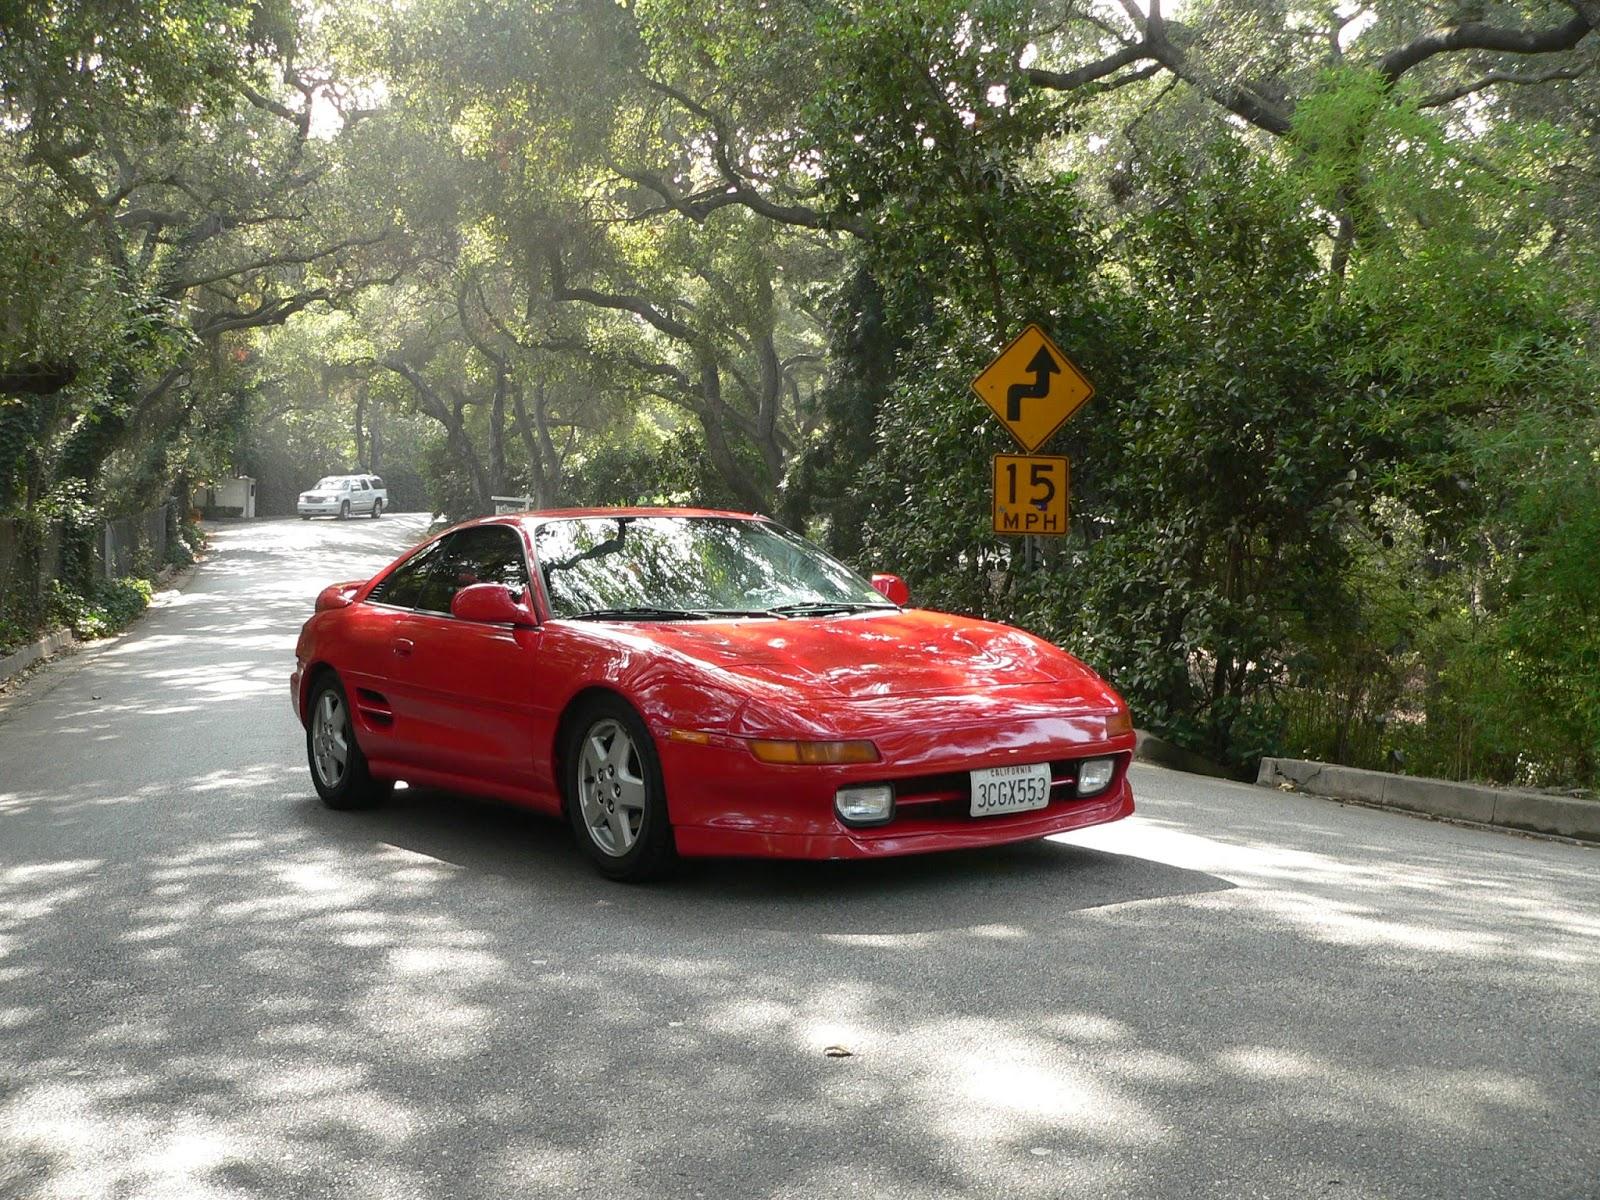 mr2 Φέρτε πίσω τα pop ups: 12 πάμφθηνα αυτοκίνητα που τα χουν Fiat X1/9, Honda, Lotus, mazda mx-5, Mazda RX-7, Mitsubishi 3000GT, Nissan 200SX, pop ups, Porsche, Toyota, Toyota AE86, Toyota MR2, zblog, μεταχειρισμένα, φανάρια ανακλινόμενα